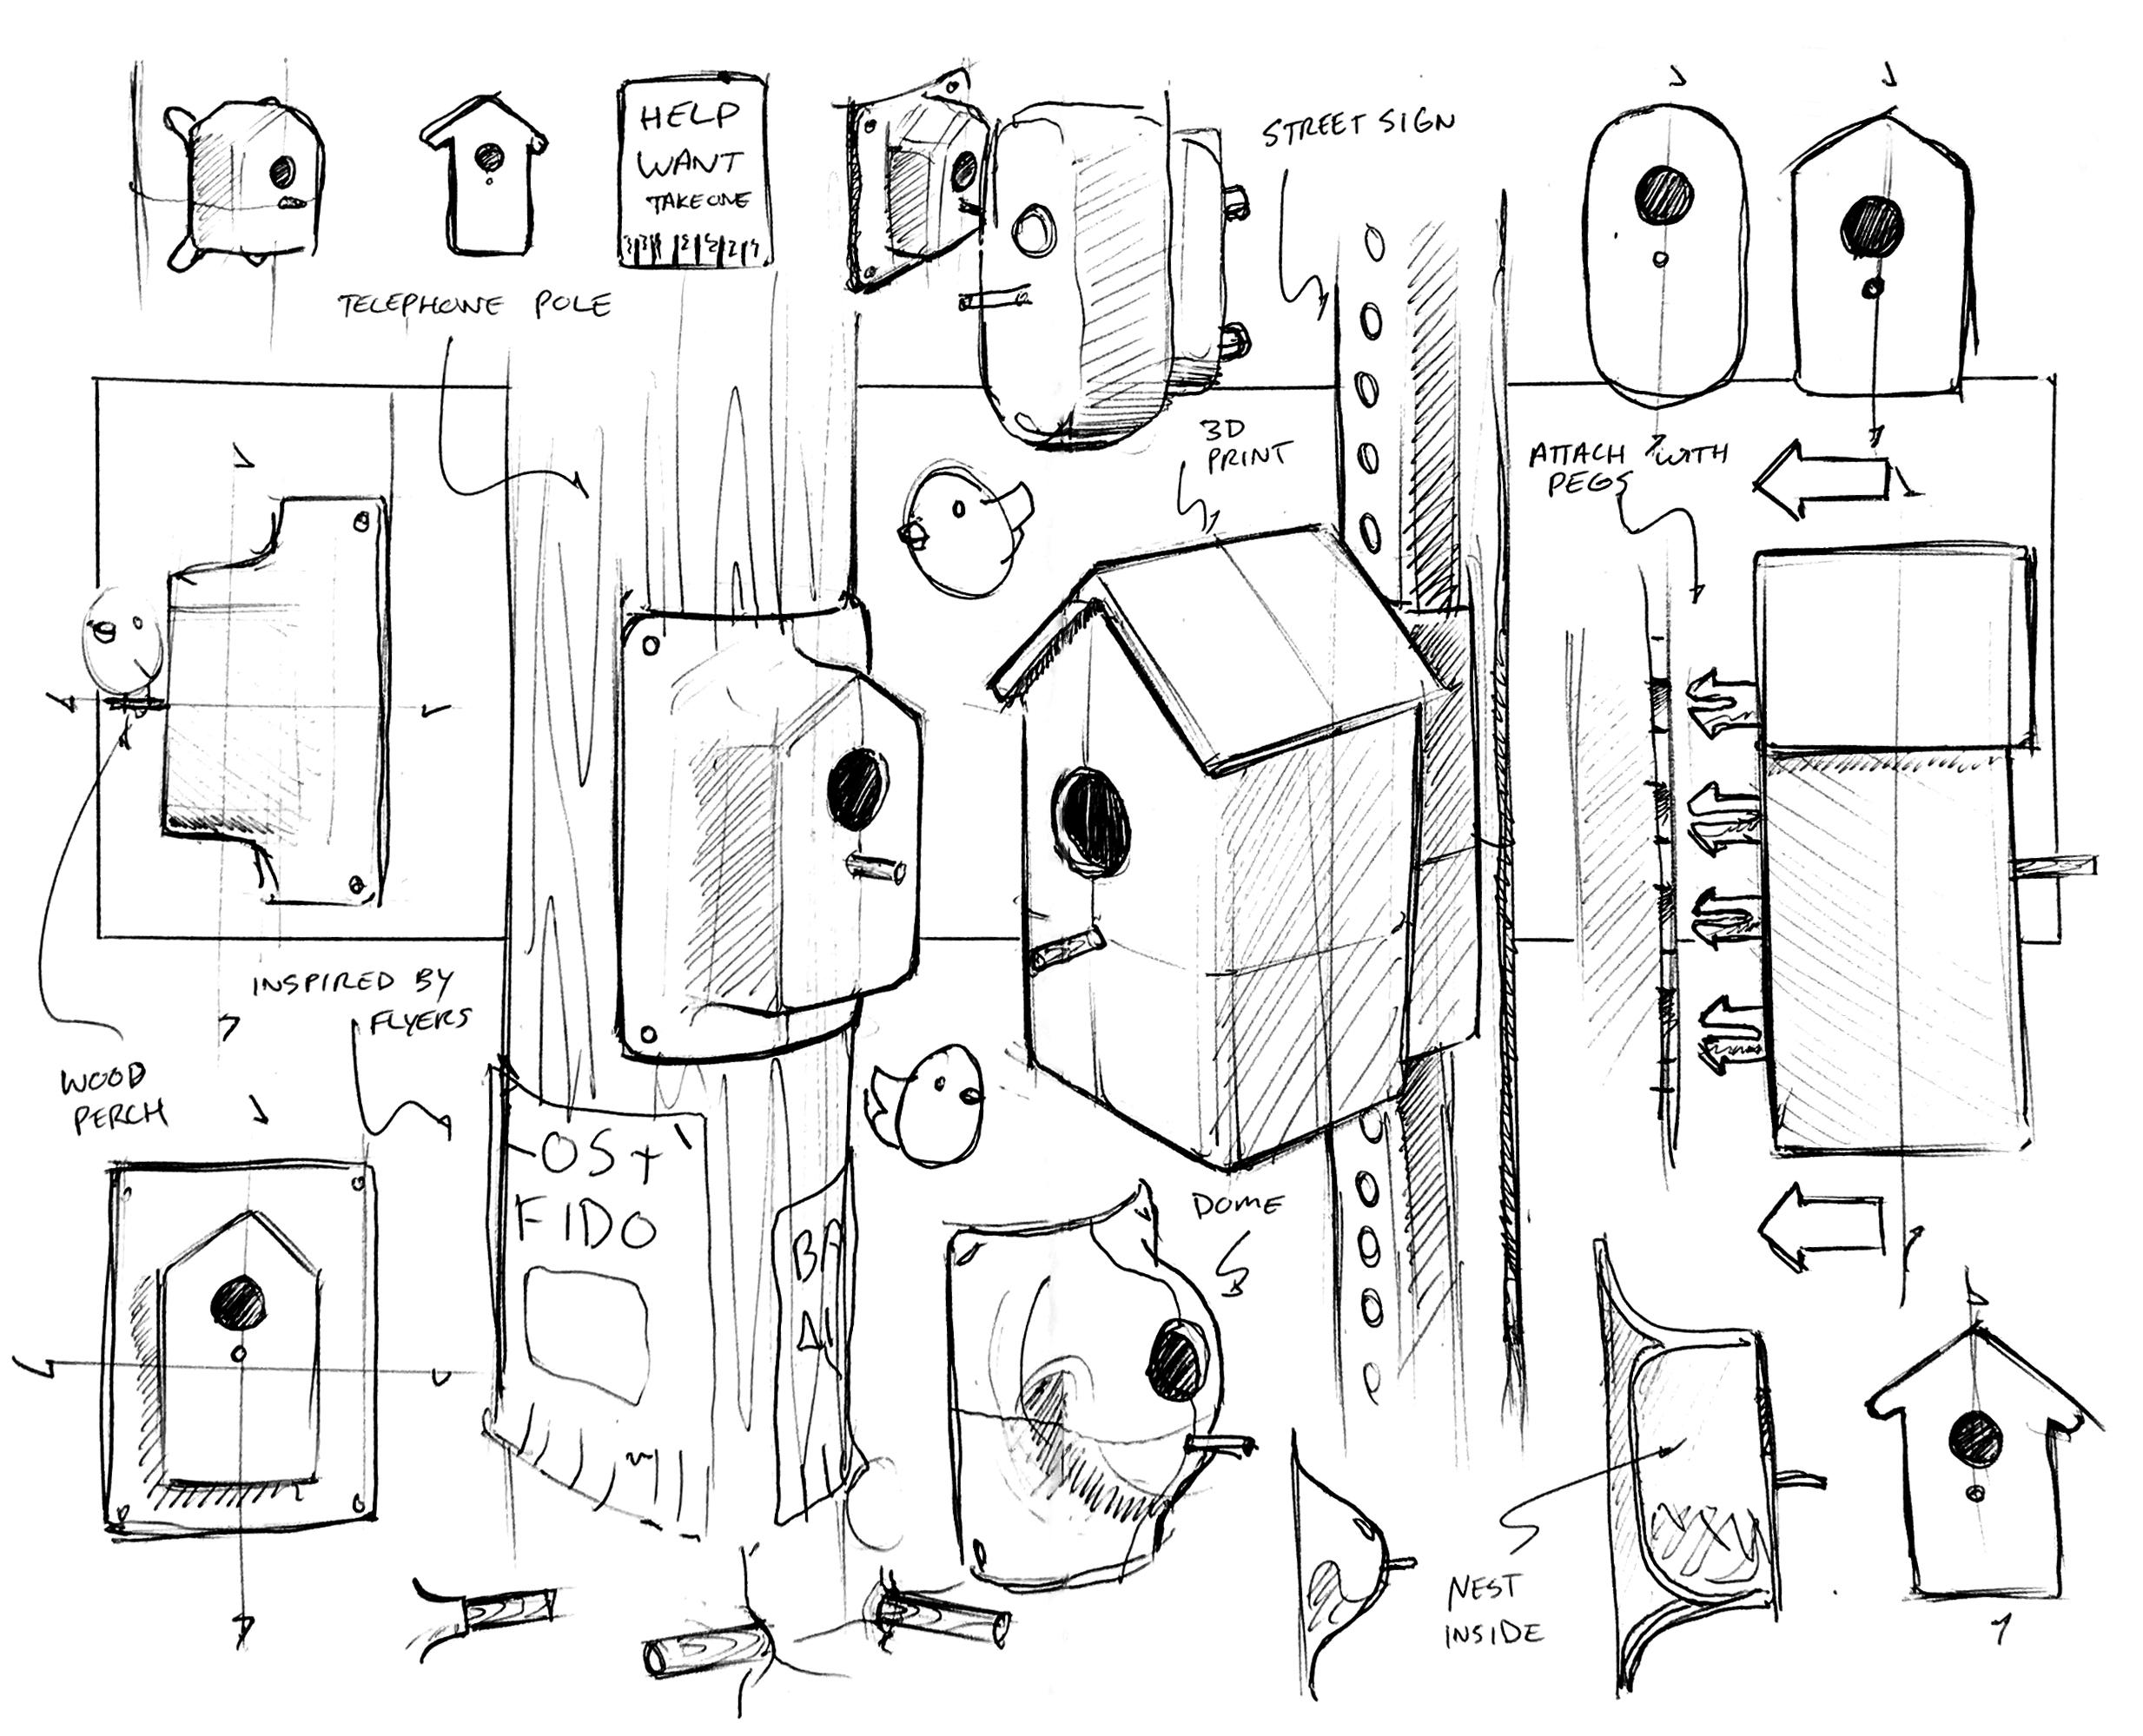 flyer-birdhouse-sketches-nicholas-baker